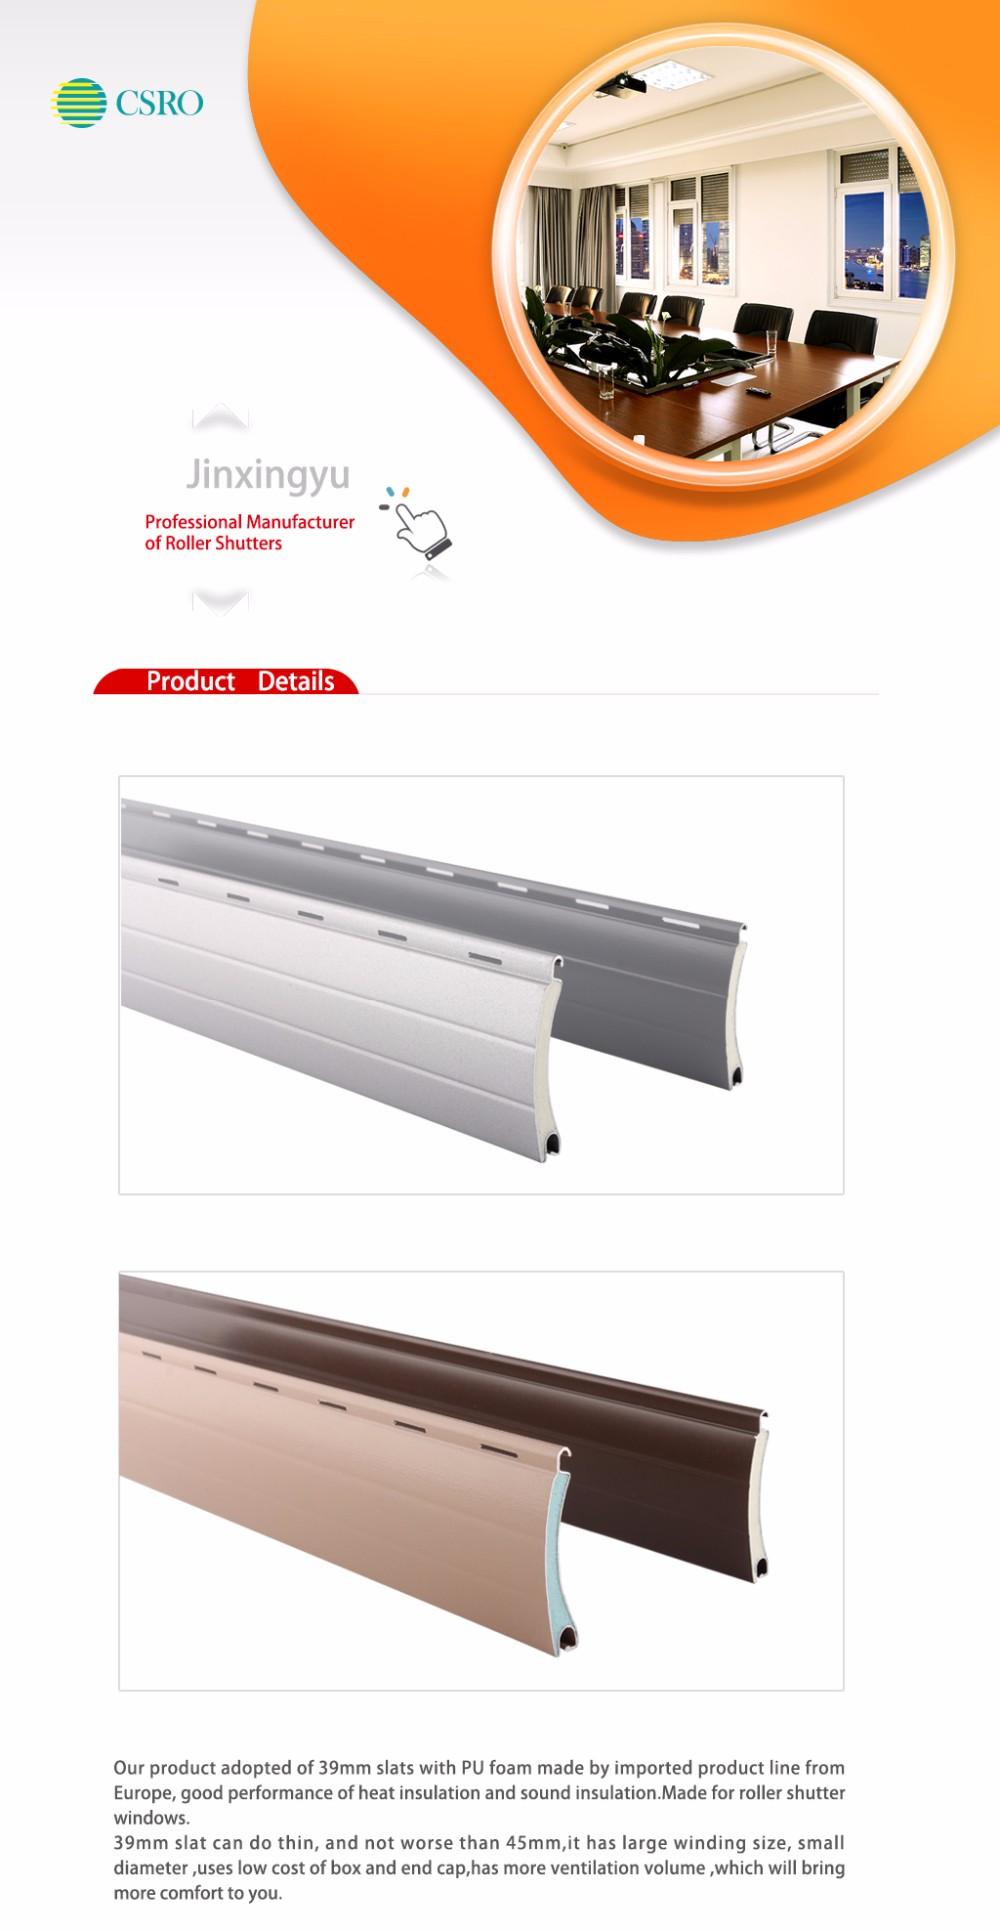 39mm Foam Filled Slat Insulated Exterior Shutters For Windows Buy Exterior Shutters For Windows Exterior Shutters For Windows Parts Insulated